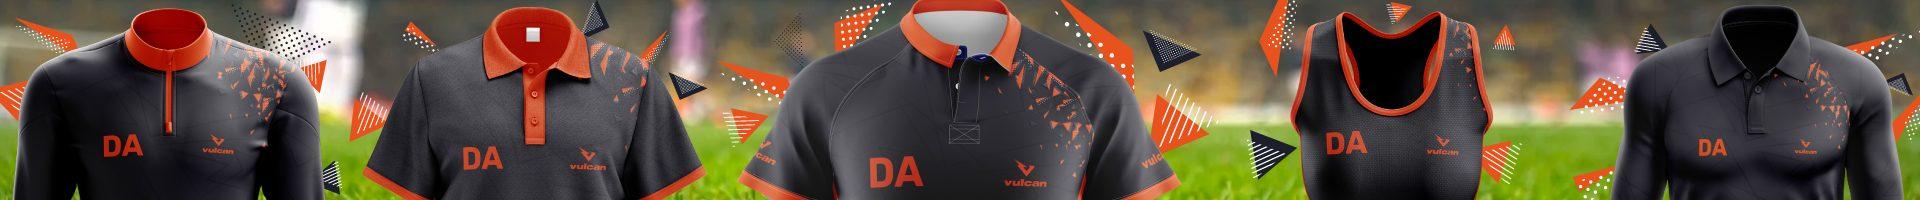 vulcan-sports-kit-builder-inspiration-1900x200px